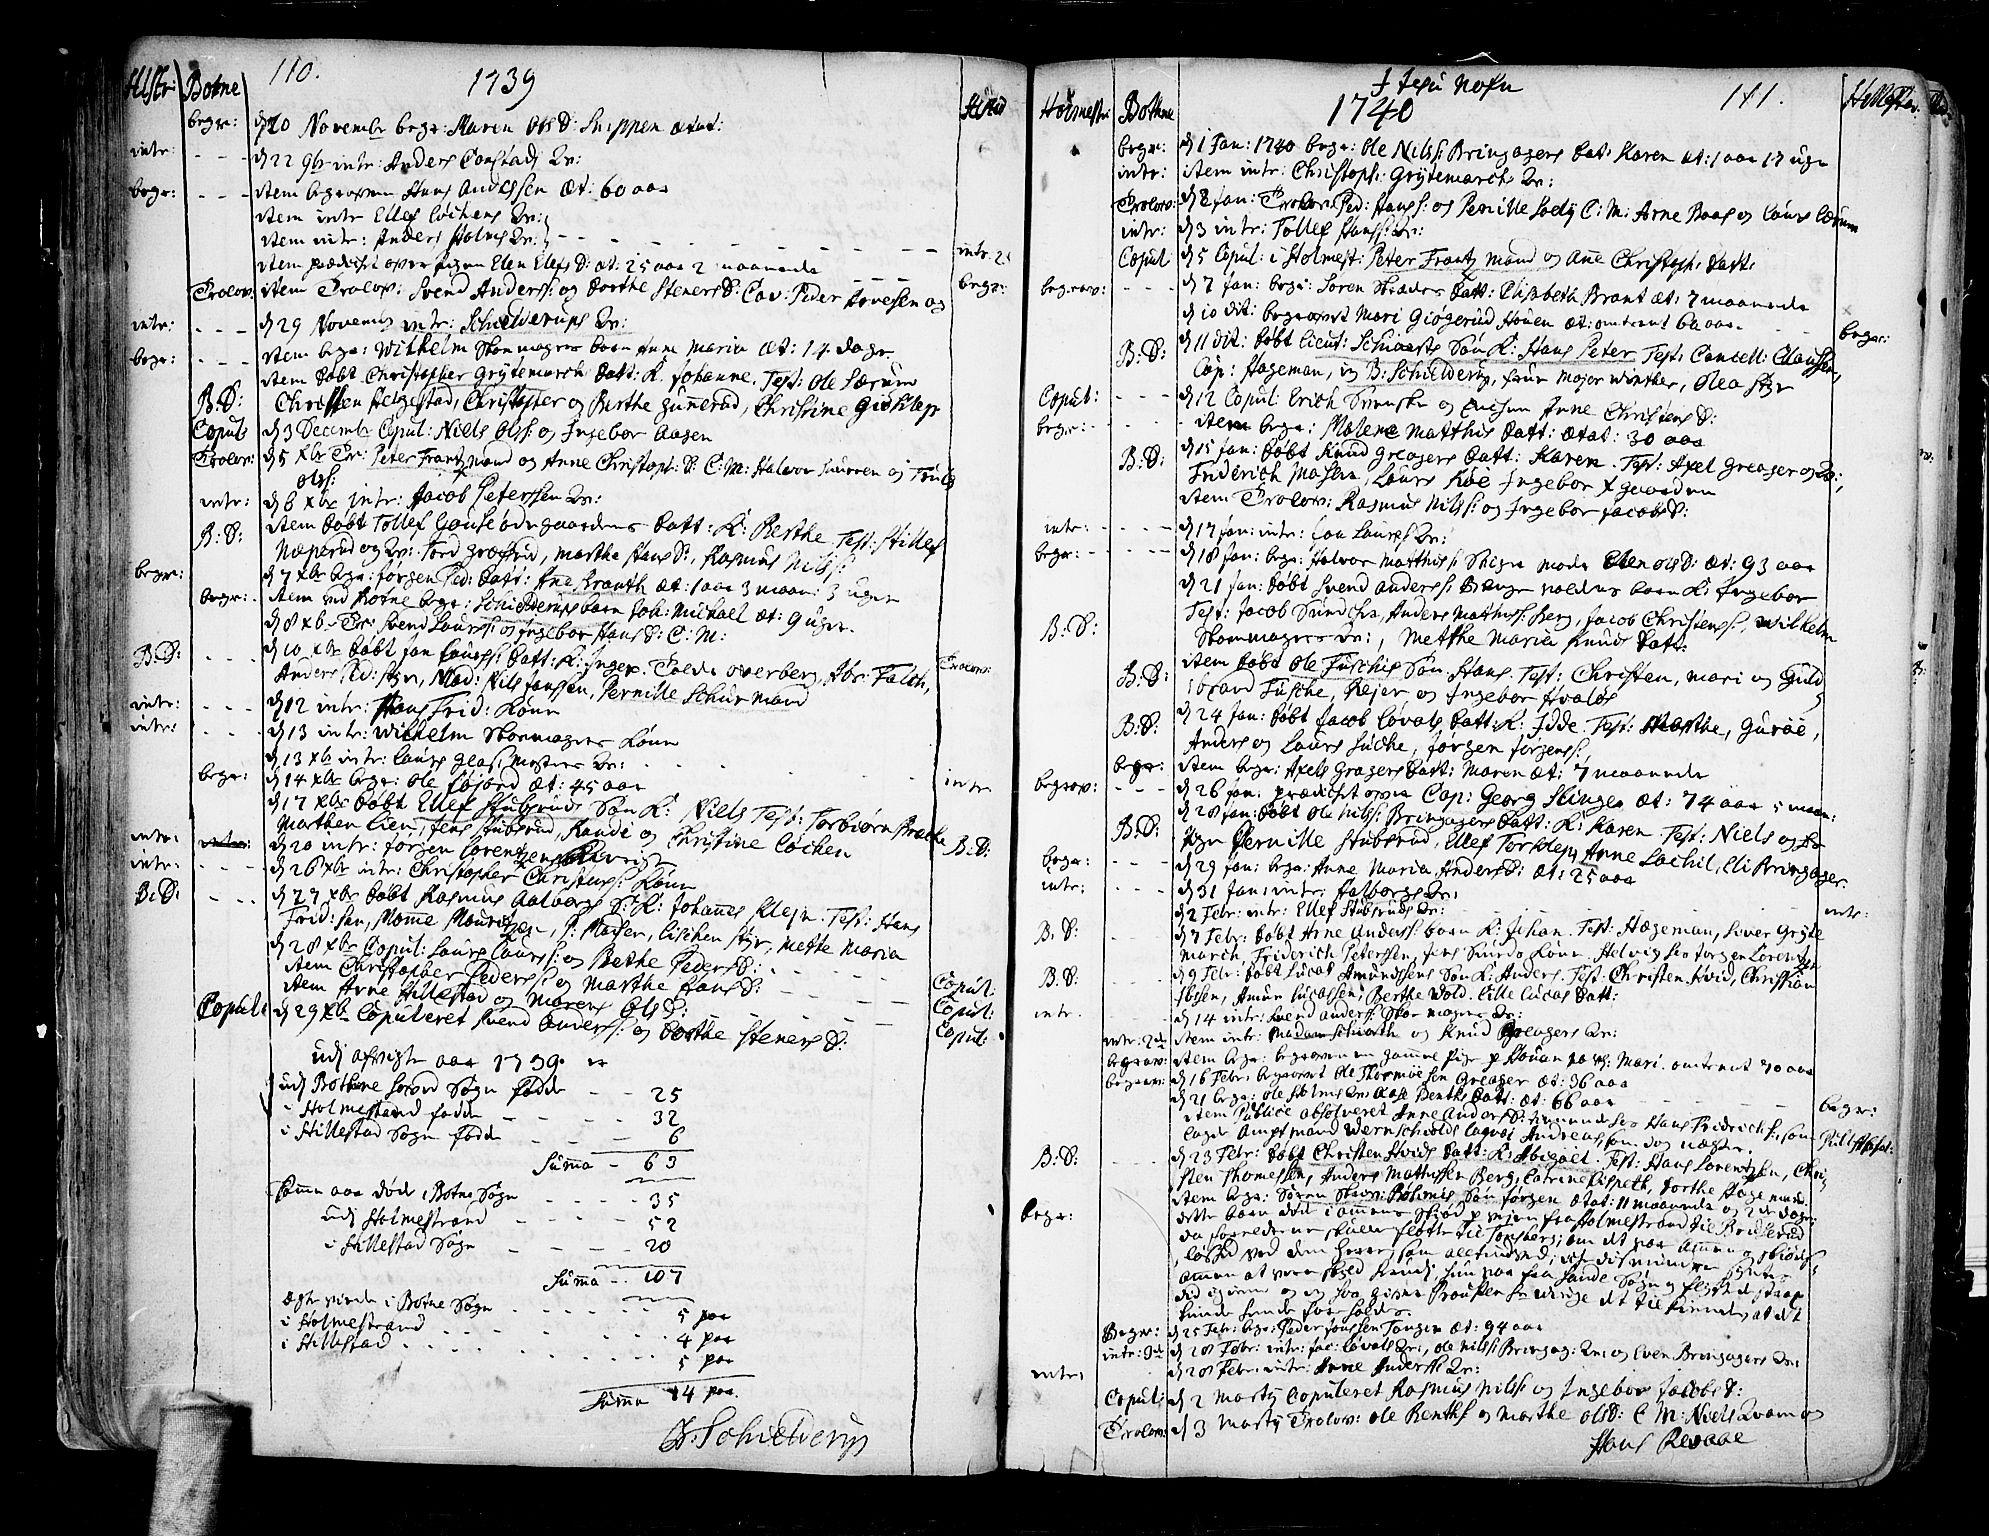 SAKO, Botne kirkebøker, F/Fa/L0001a: Ministerialbok nr. I 1A, 1707-1778, s. 110-111